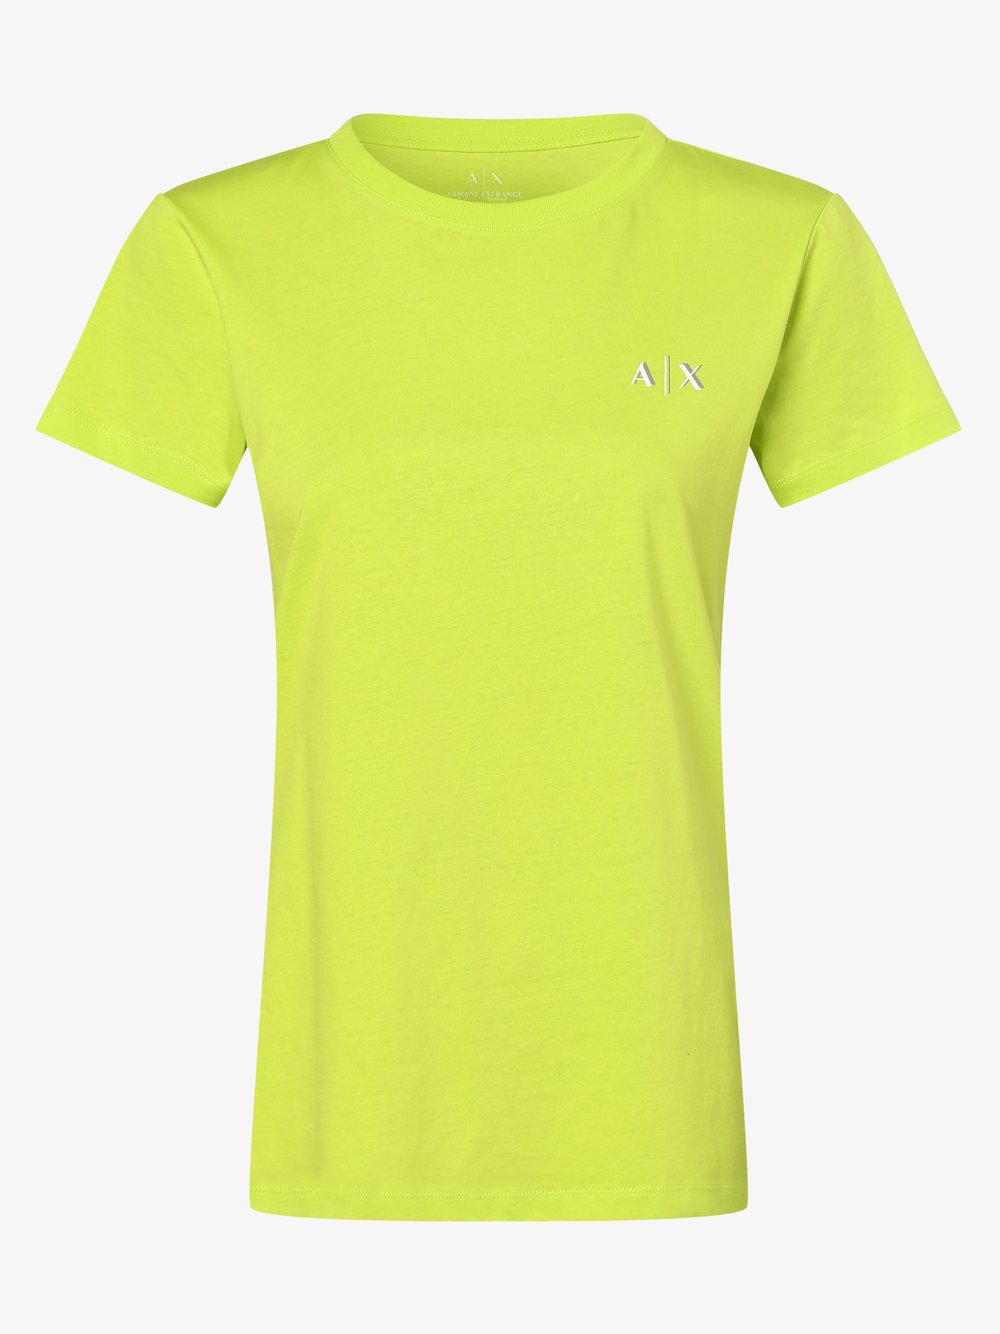 Armani Exchange - T-shirt damski, żółty